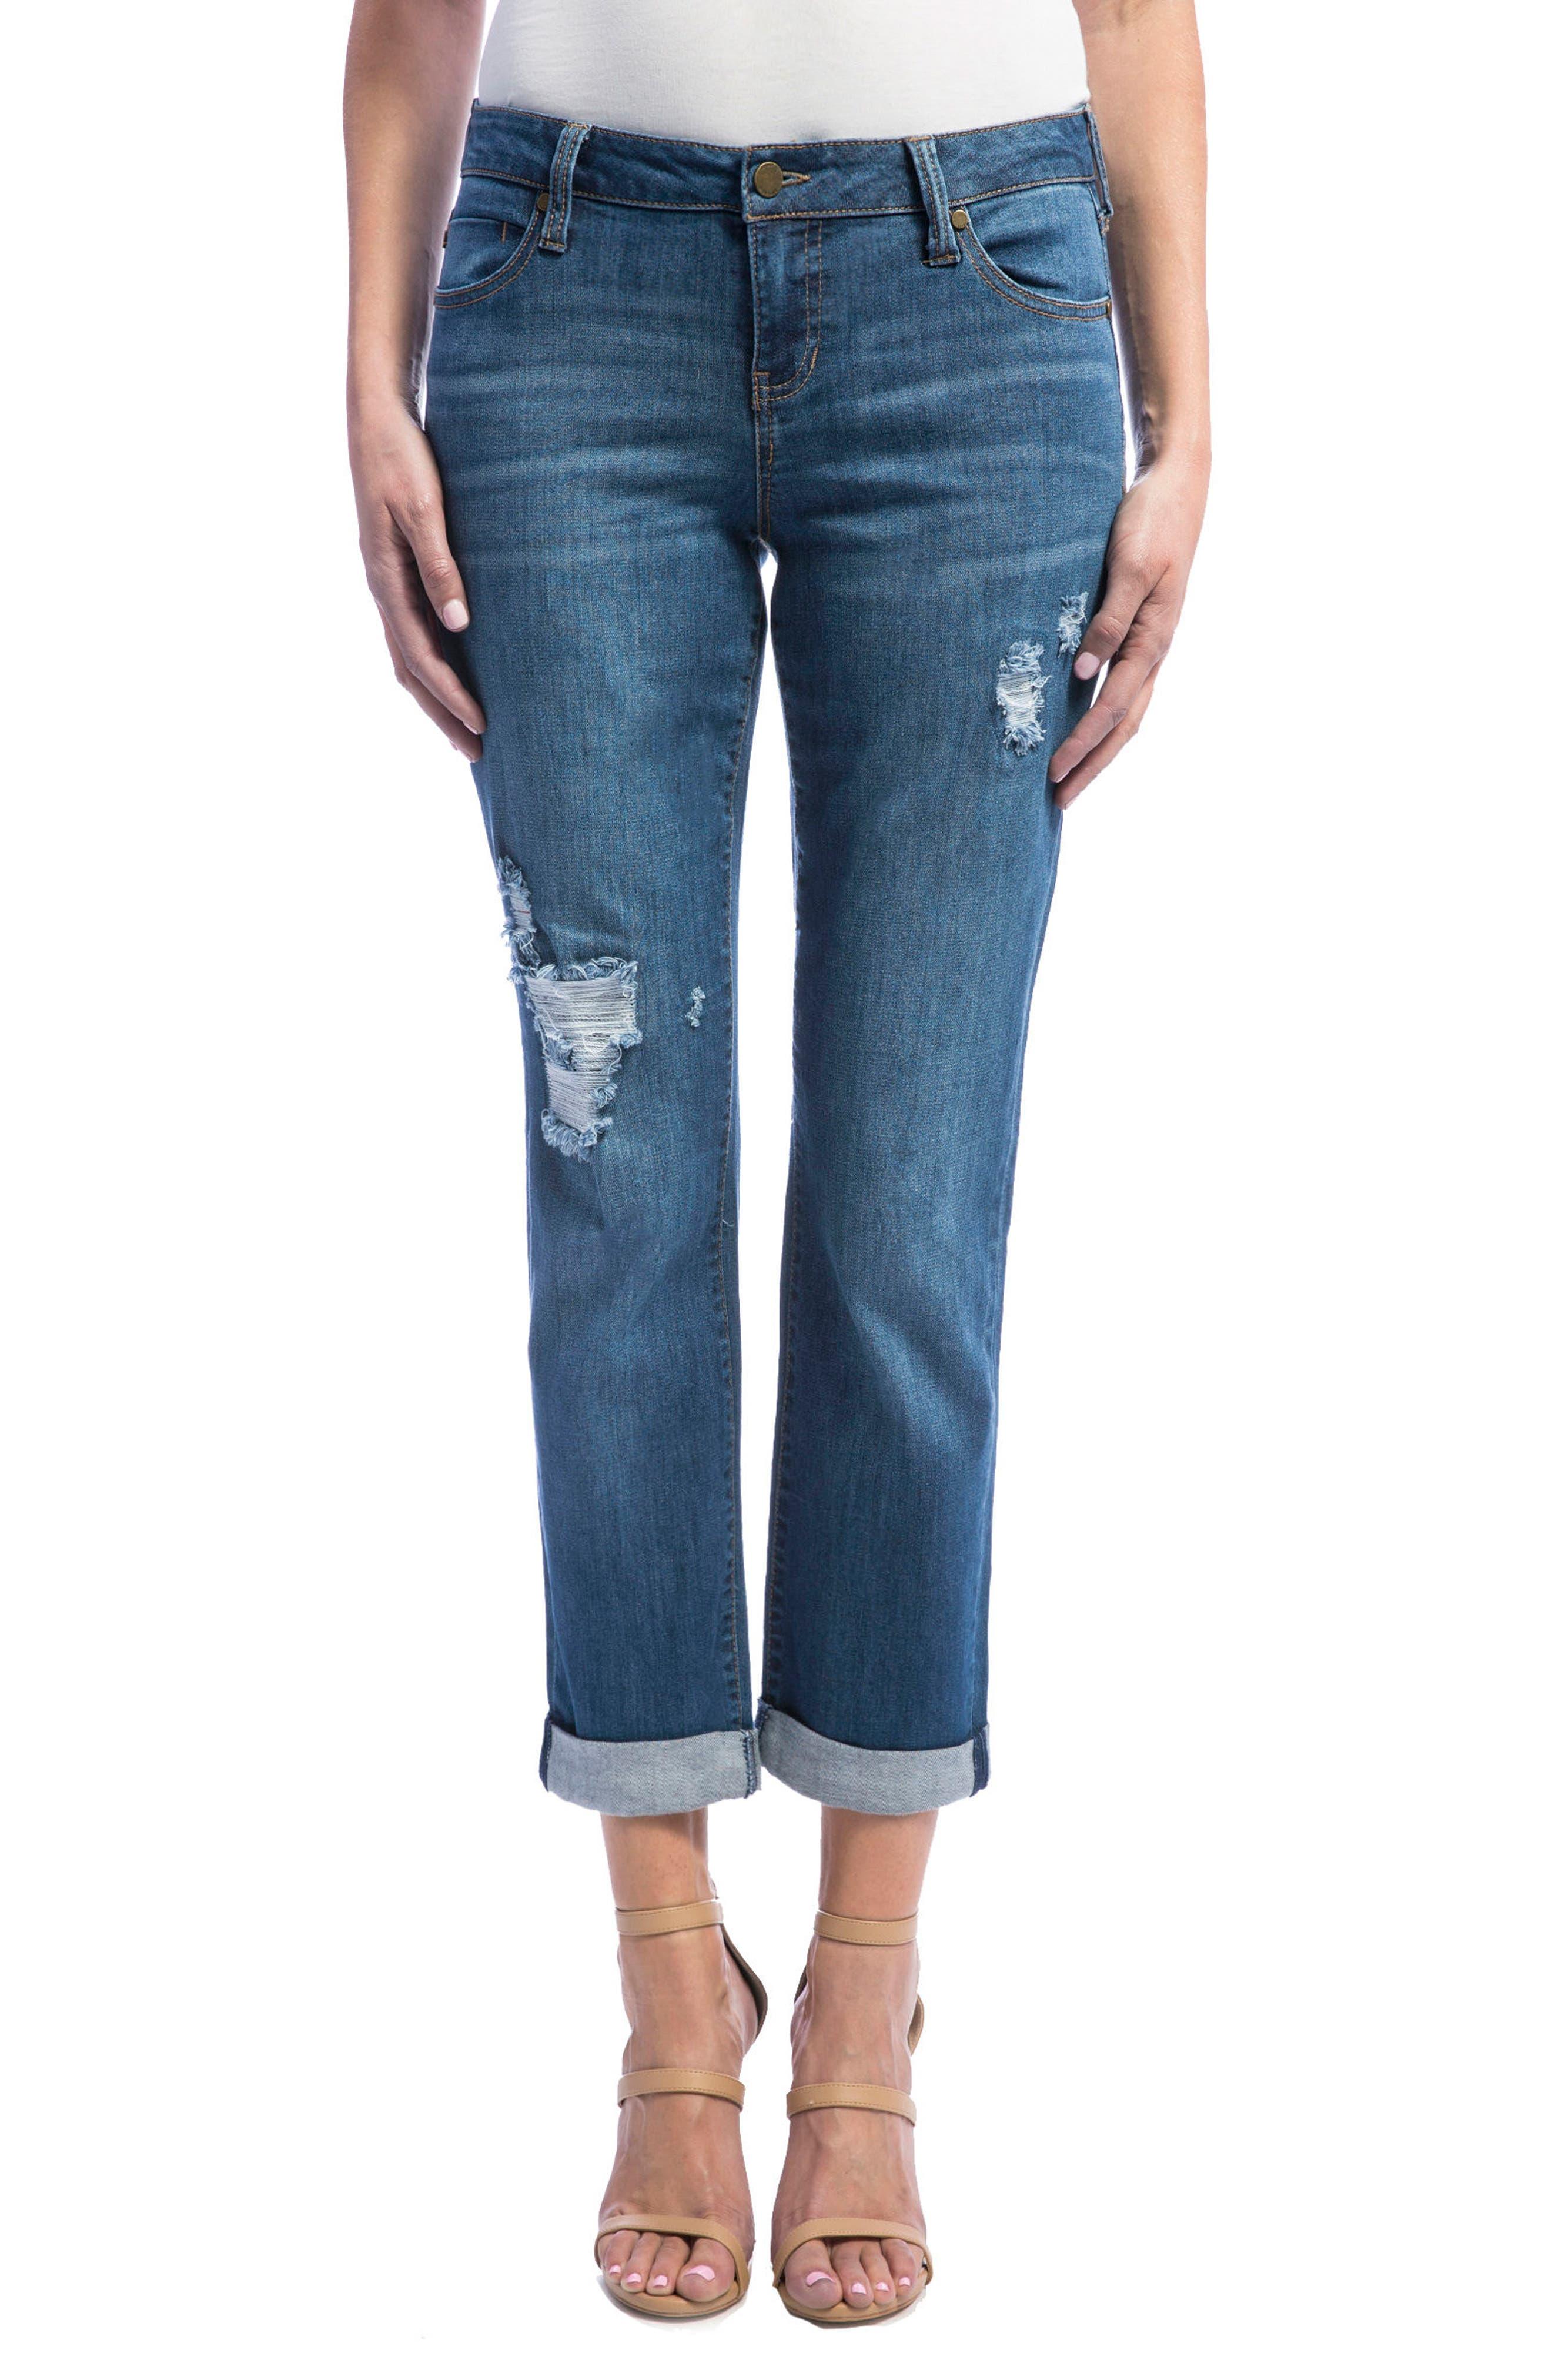 Jeans Company Peyton Slim Stretch Crop Boyfriend Jeans,                             Main thumbnail 1, color,                             401